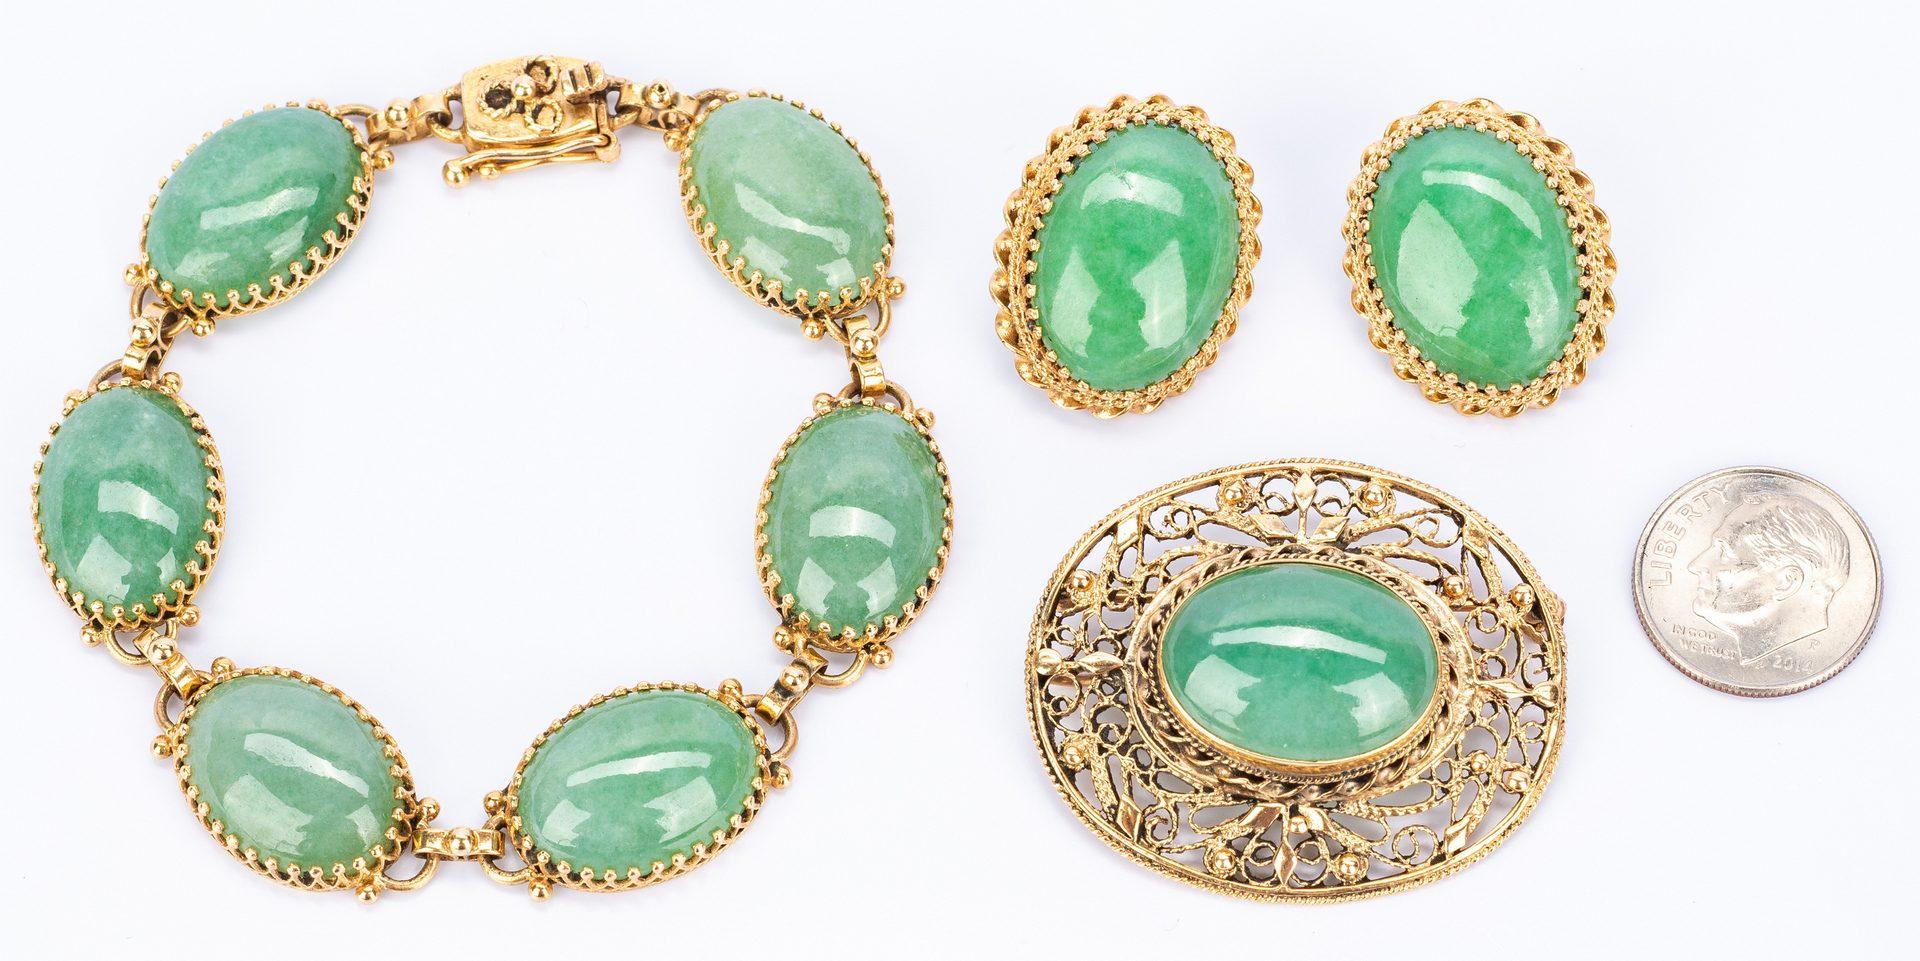 Lot 145: Gold Jewelry Jadite Set